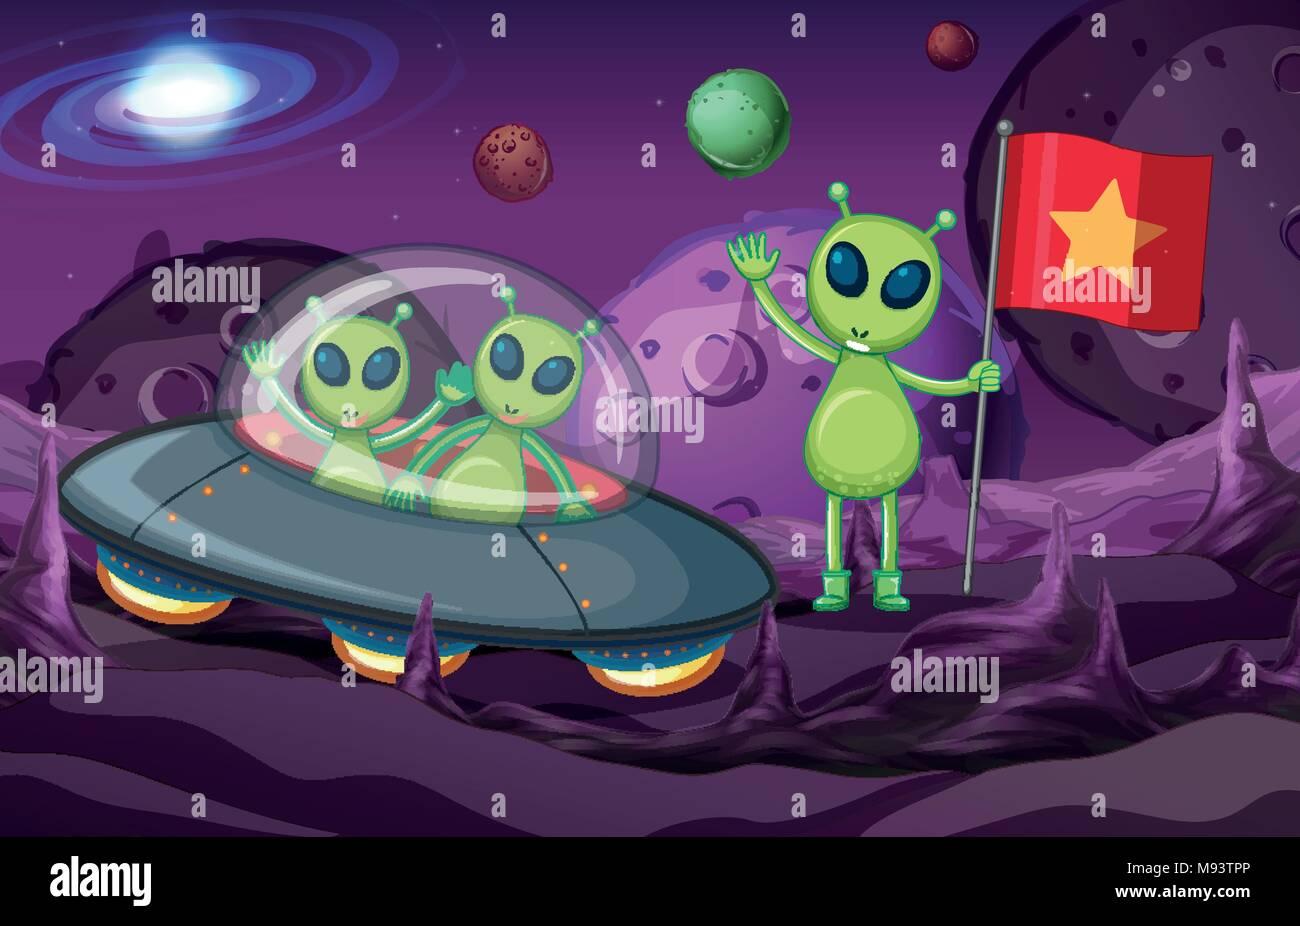 Aliens in UFO exploring space illustration - Stock Vector